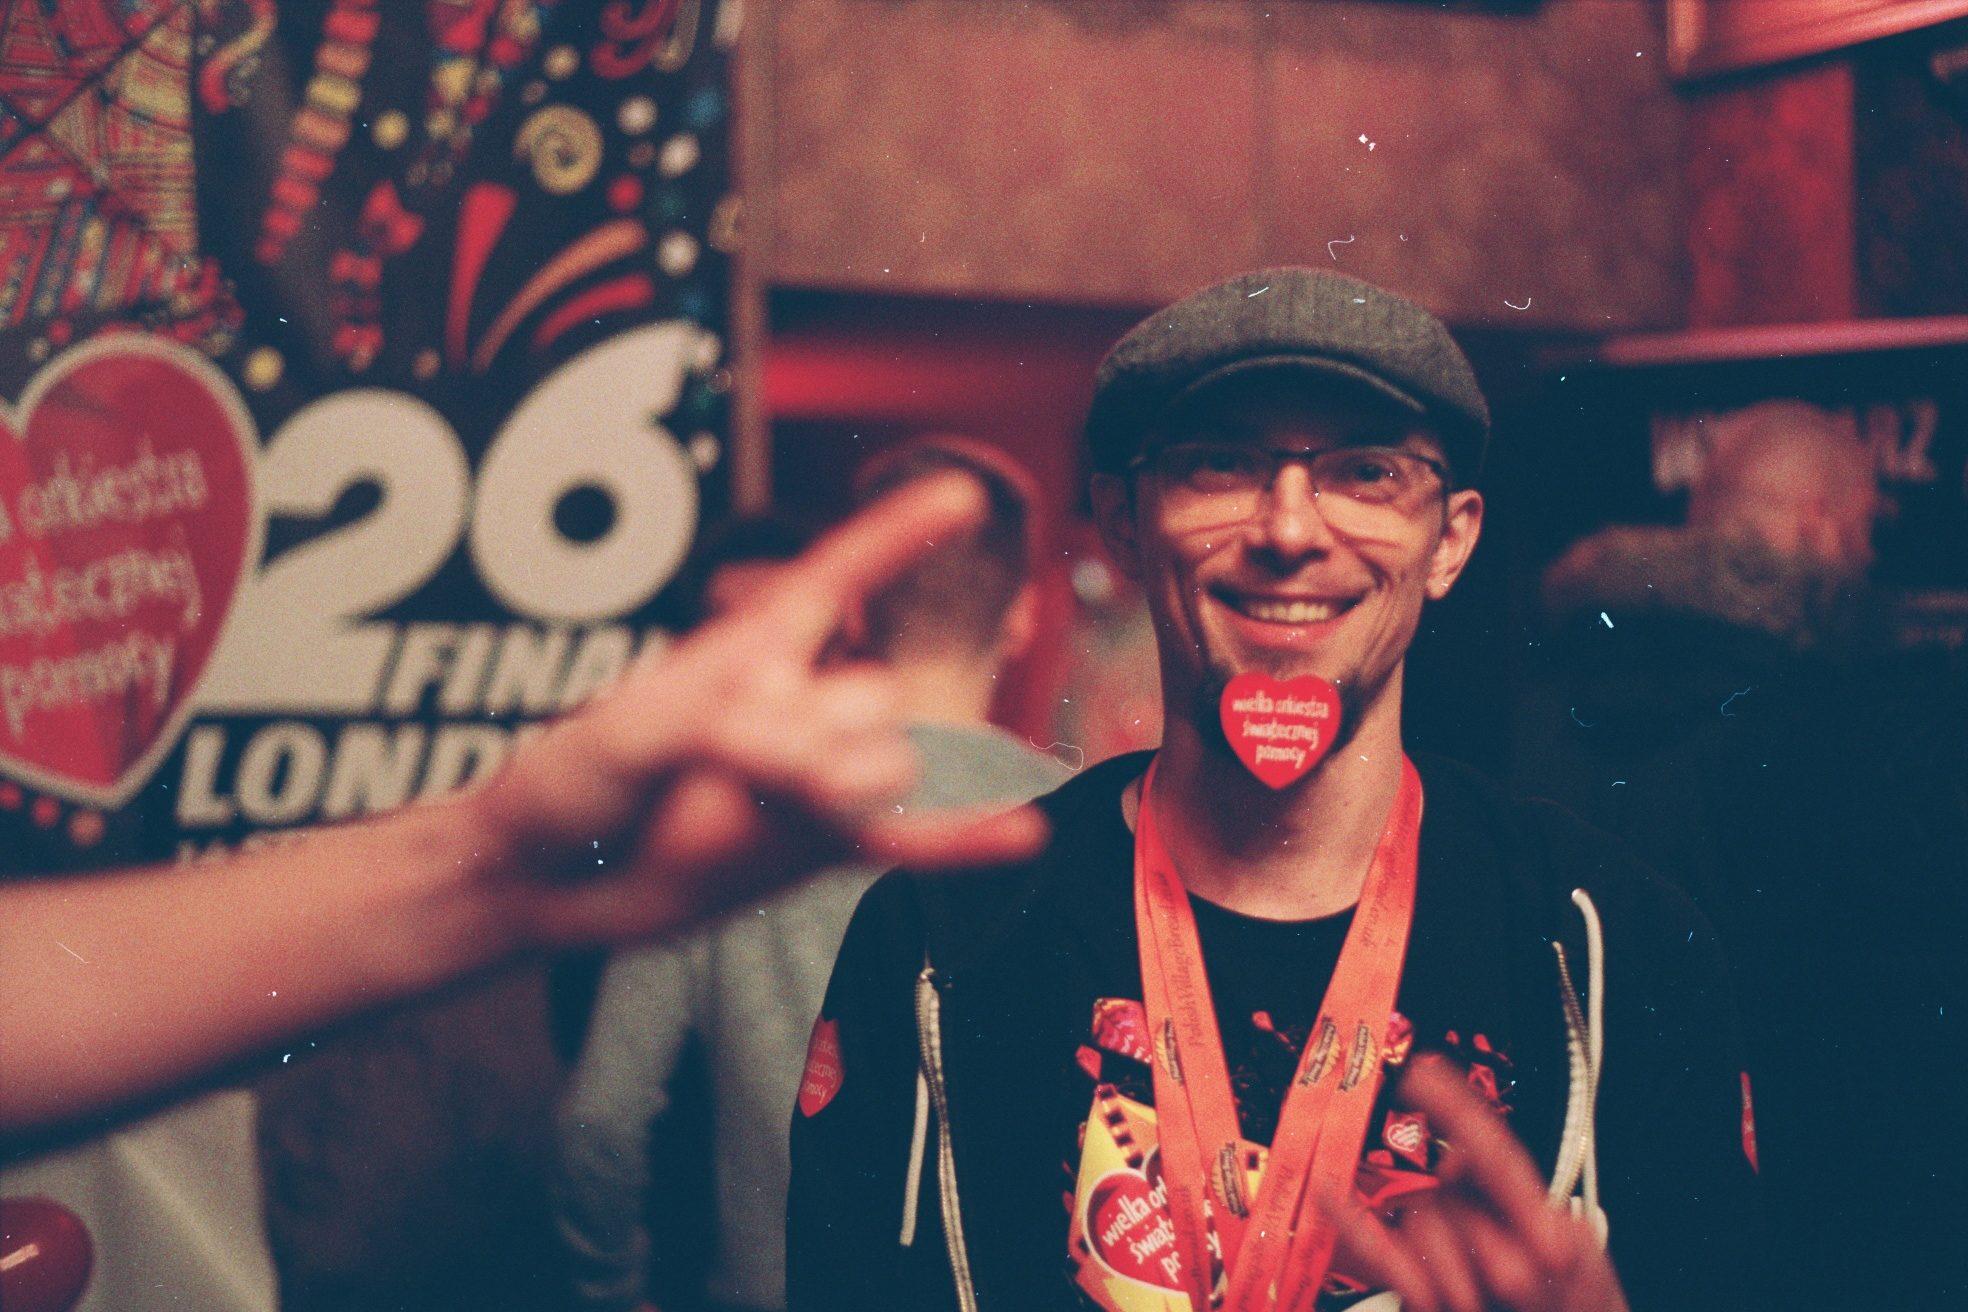 Kamil, with a sticker on his Goatee, who organised volunteers at the GOCC (WOŚP) final in London Fot. Bartosz Kielak